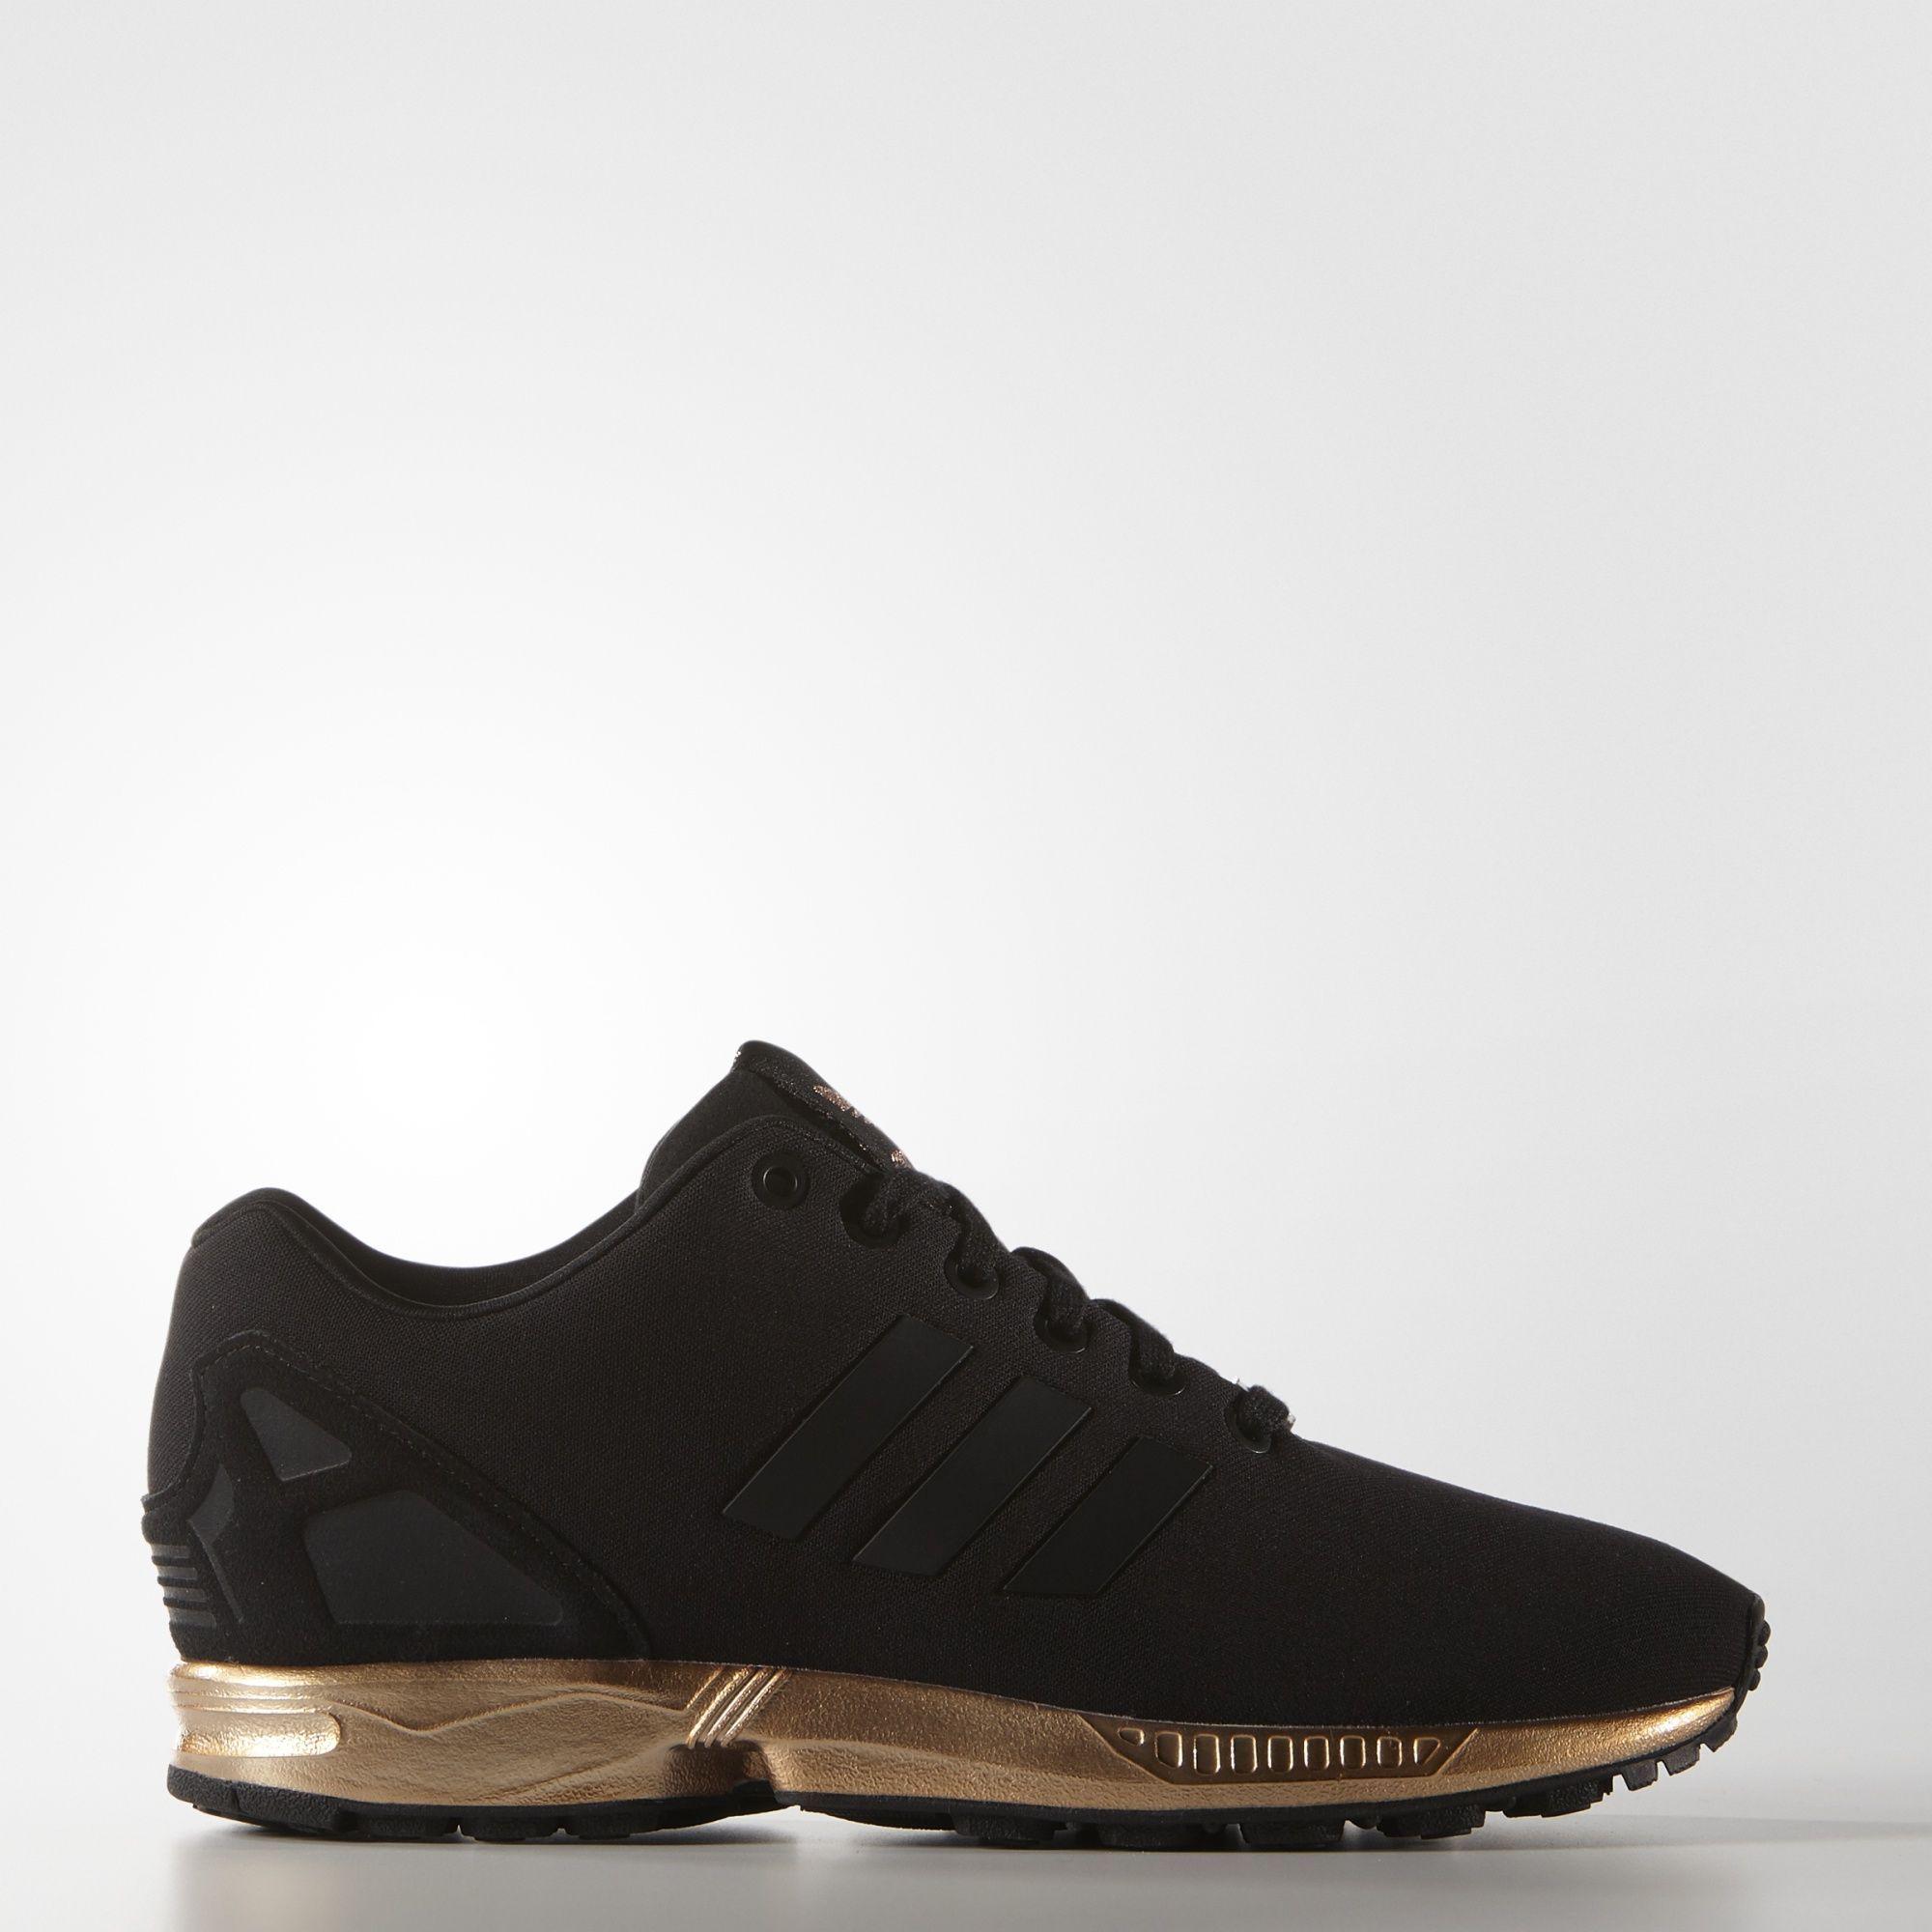 adidas zx flux metallic copper